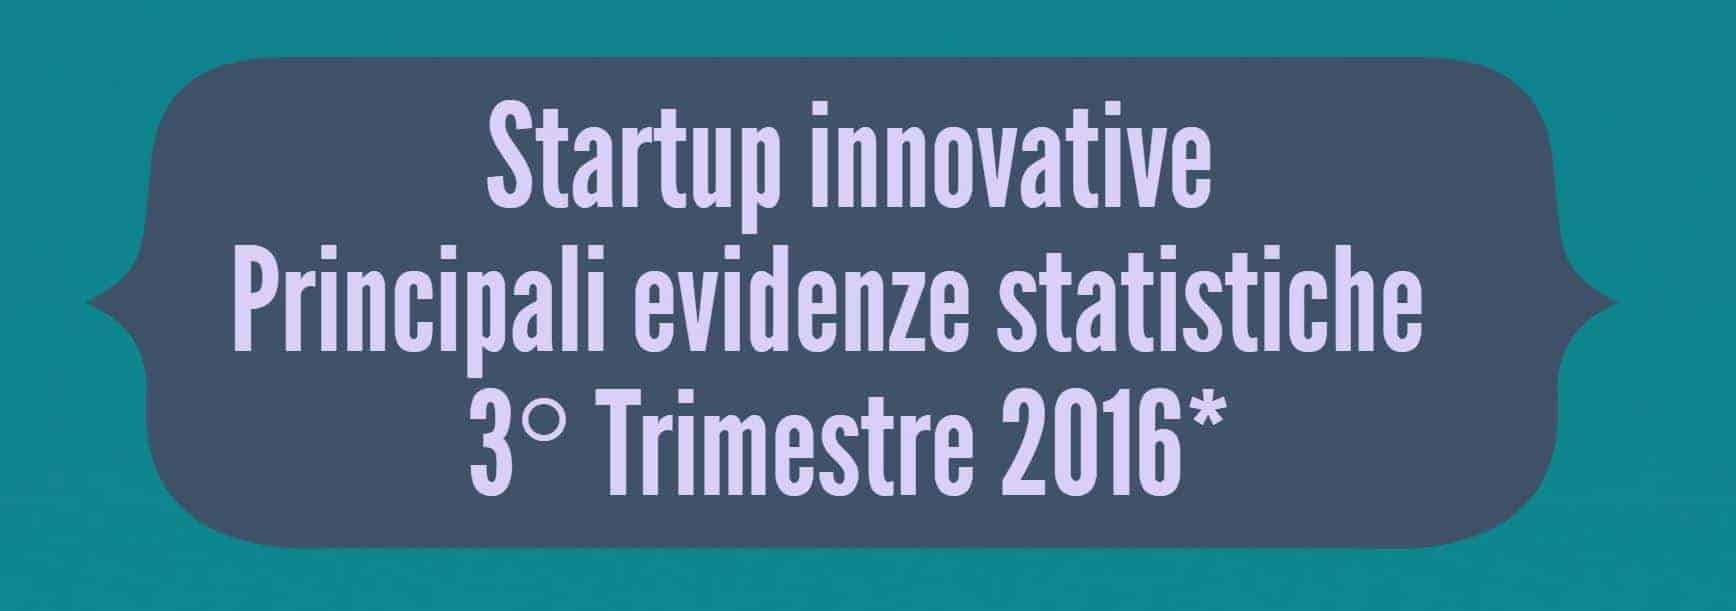 StartUp innovative 3trim